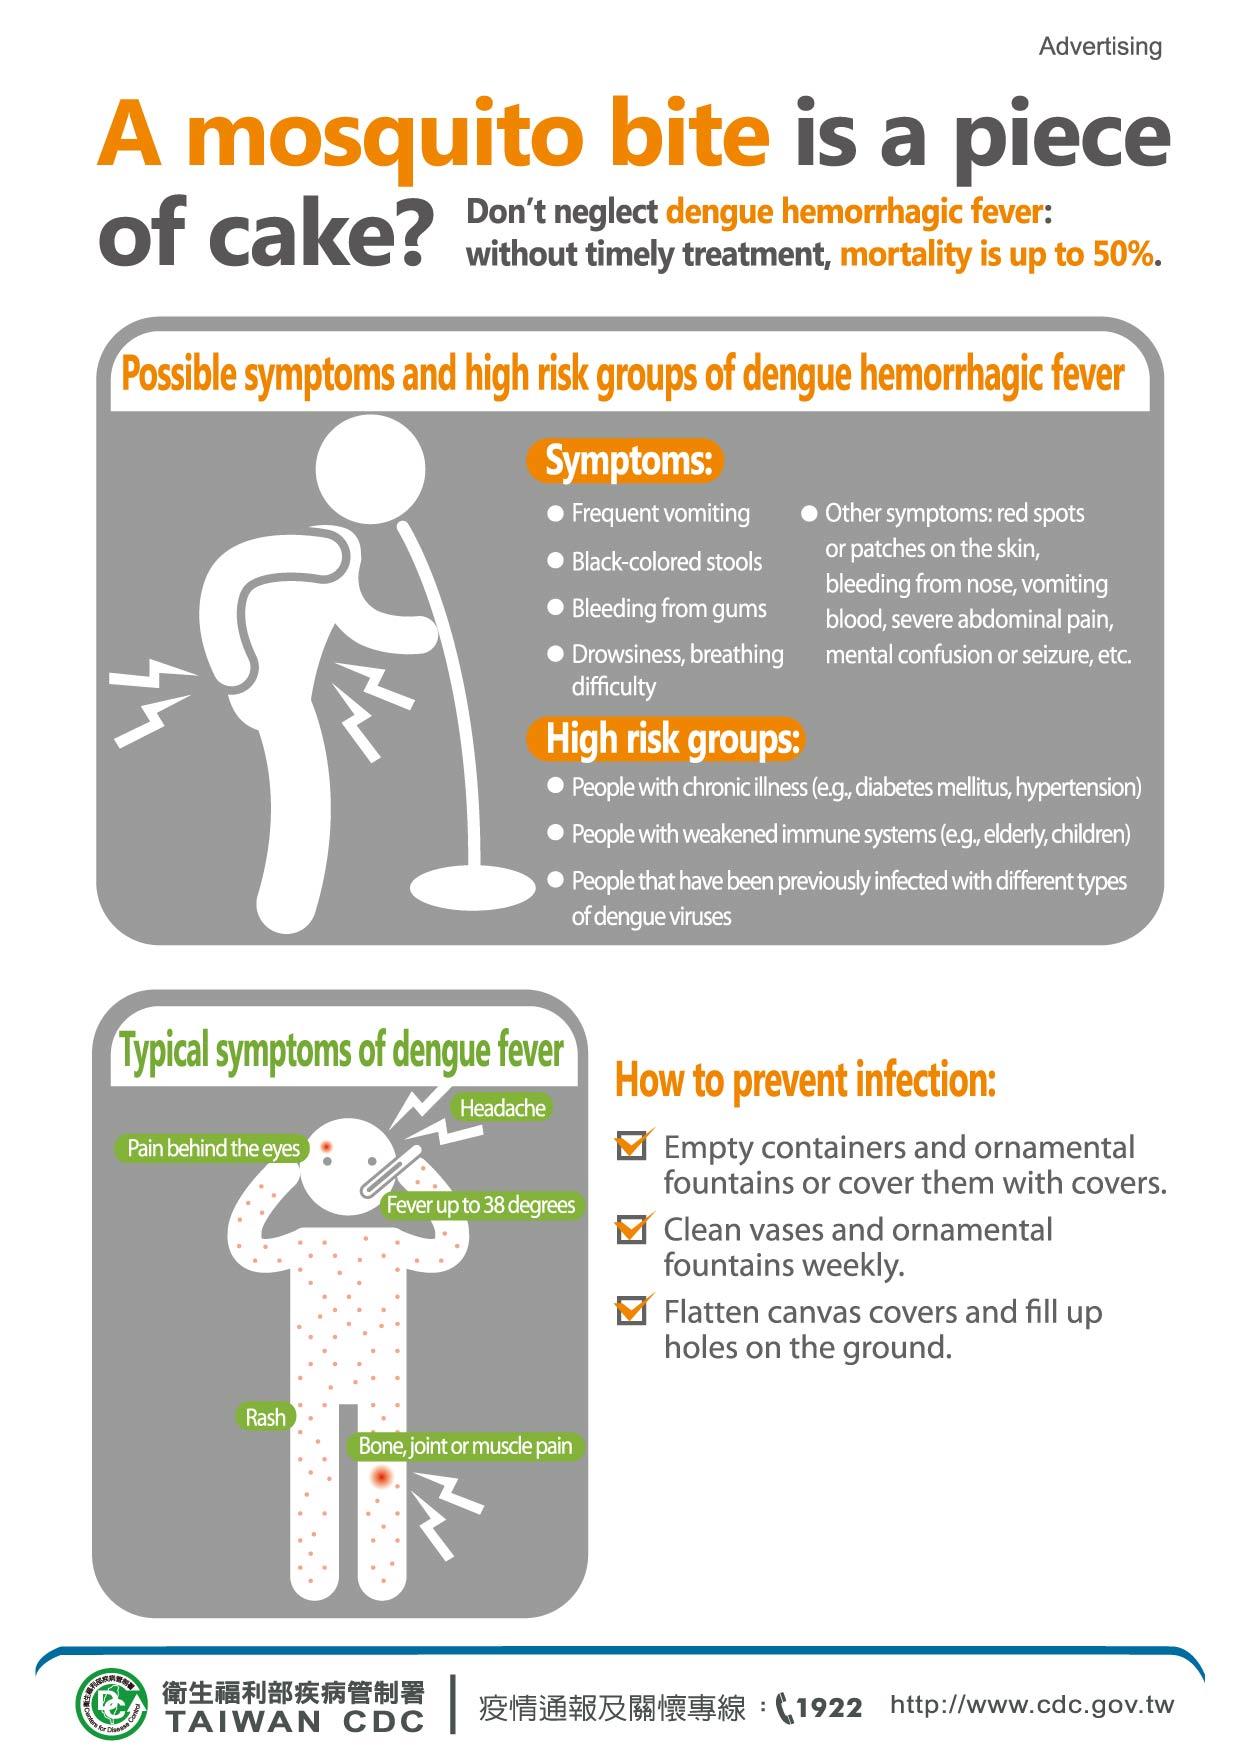 詳如附件【click me】Dengue fever prevention登革熱預防(英文)